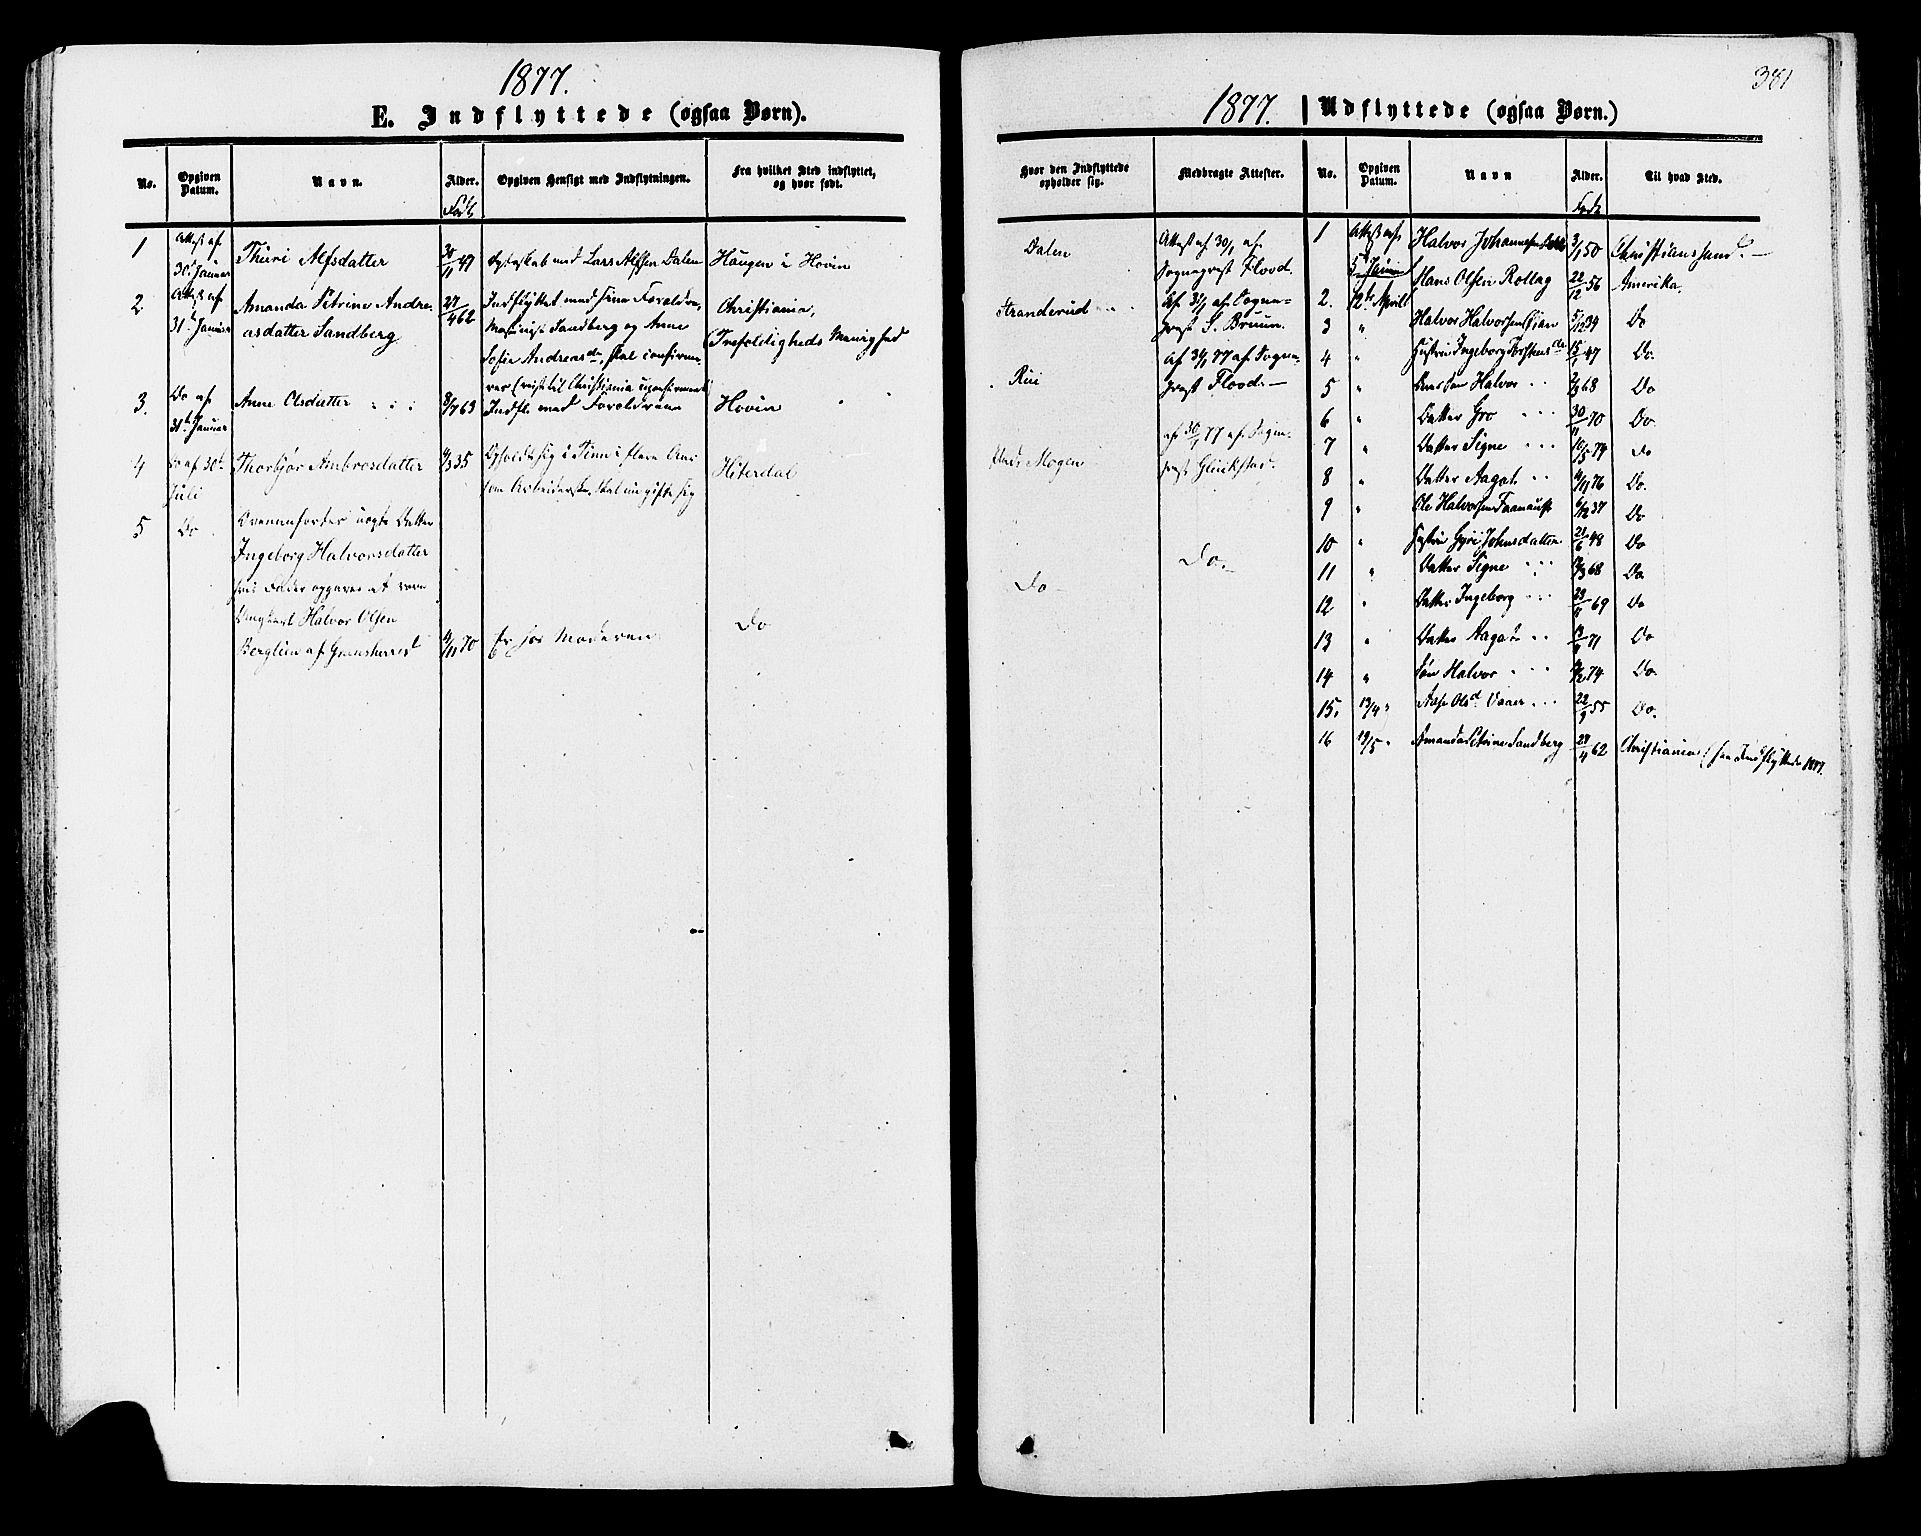 SAKO, Tinn kirkebøker, F/Fa/L0006: Ministerialbok nr. I 6, 1857-1878, s. 381